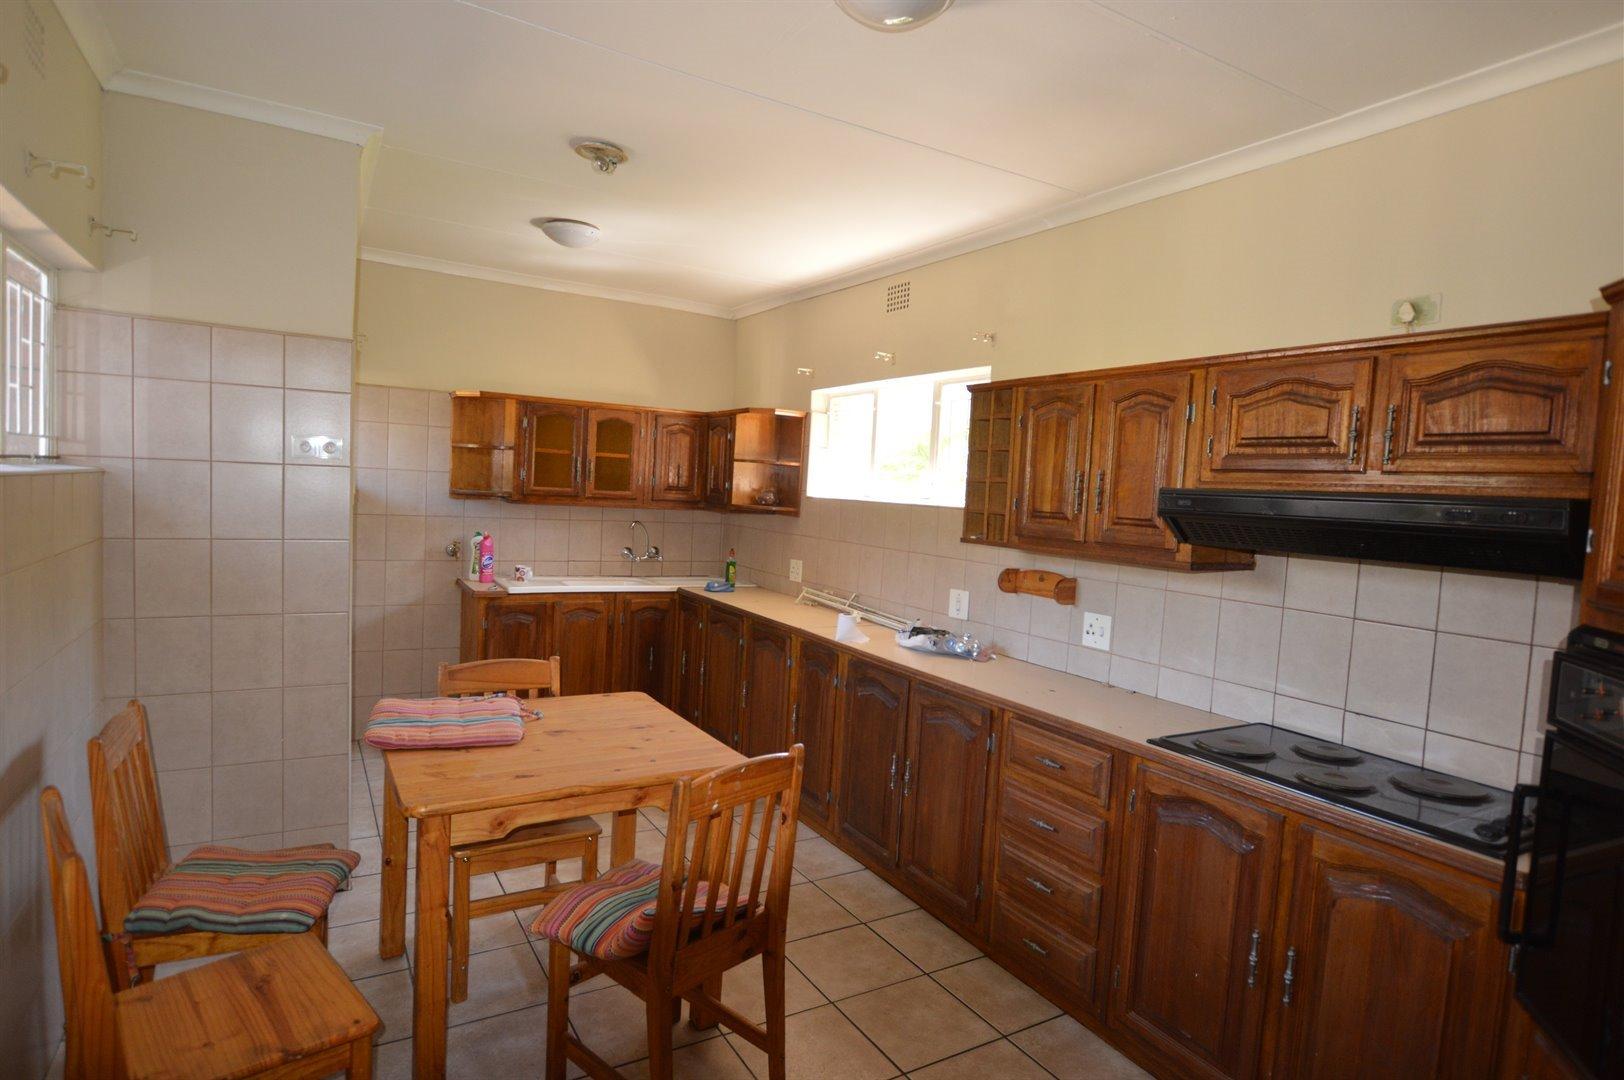 Vanderbijlpark, Vanderbijlpark Se6 Property  | Houses For Sale Vanderbijlpark Se6, Vanderbijlpark Se6, House 3 bedrooms property for sale Price:925,000